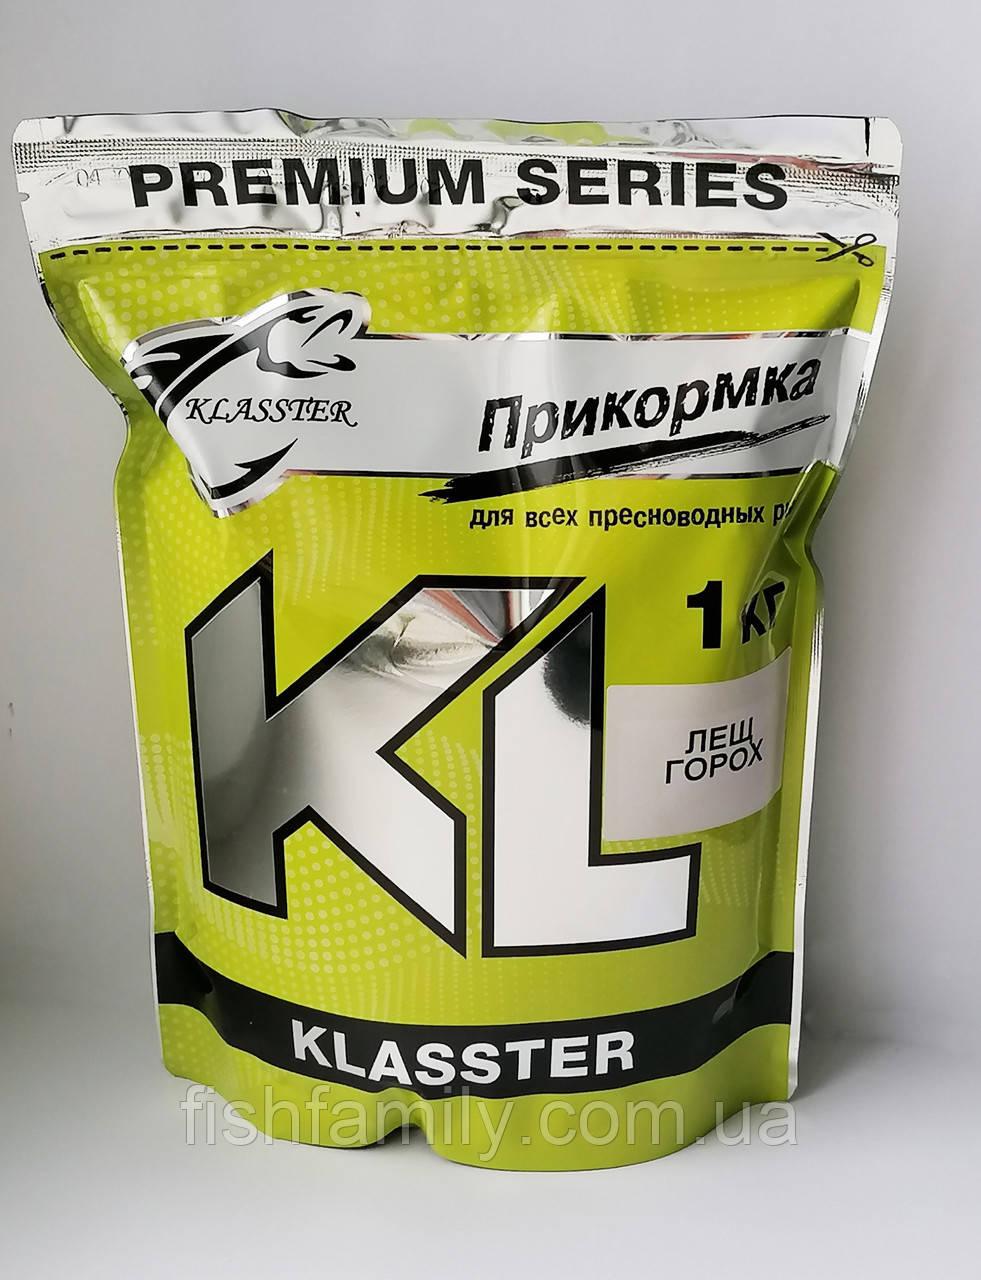 Прикормка Klasster Premium Лещ Горох 1 кг